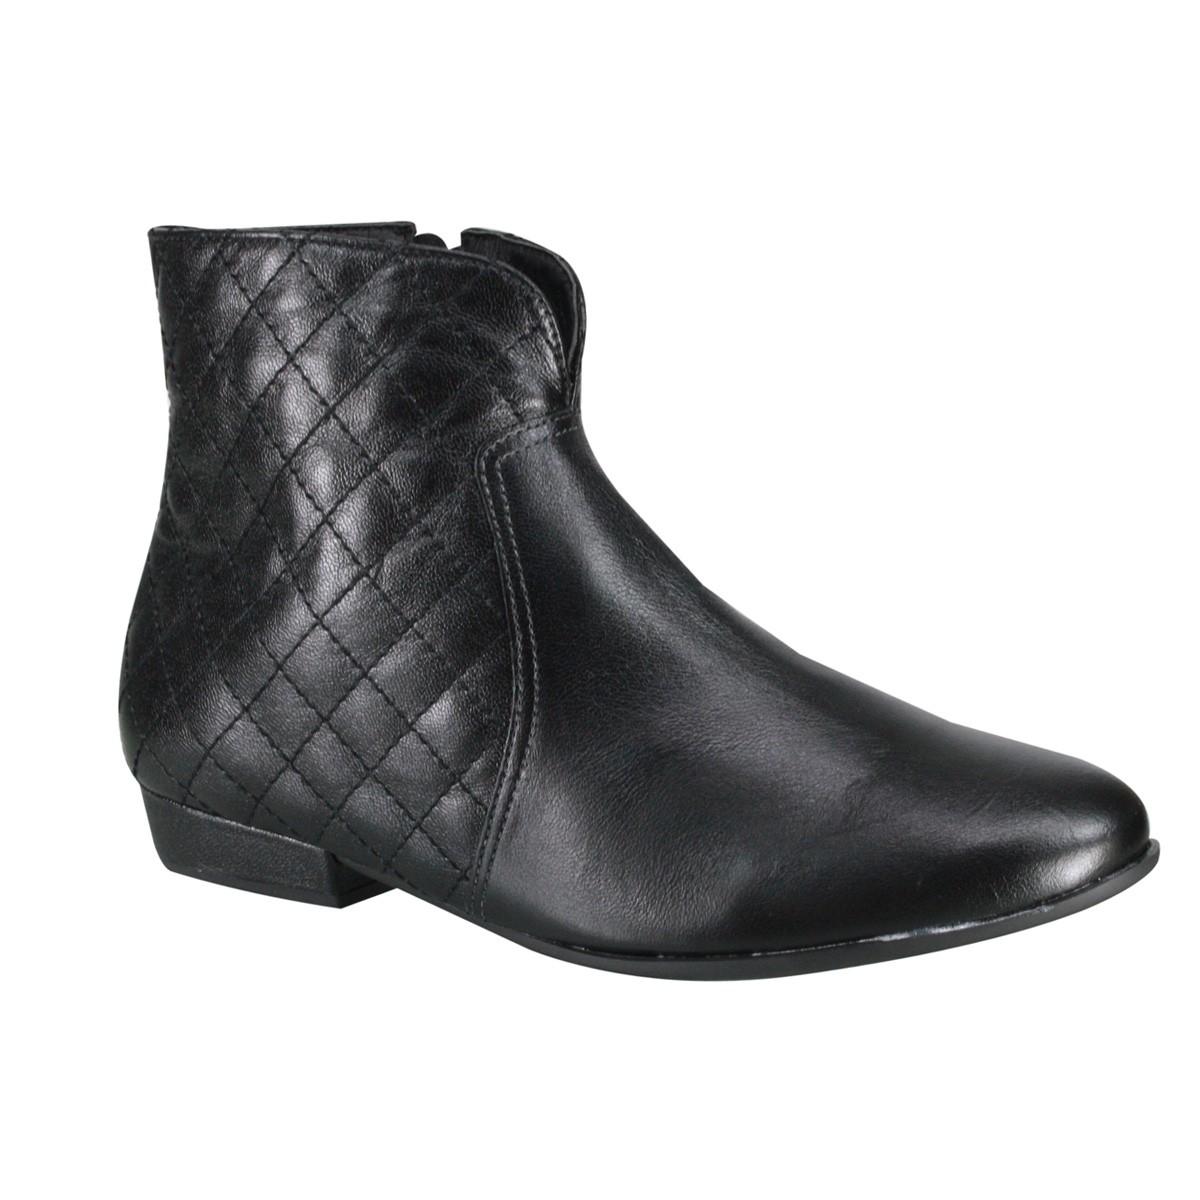 83f063545c5 Bota Ankle Boot Usaflex S5908 02 Preto (Mestiço)